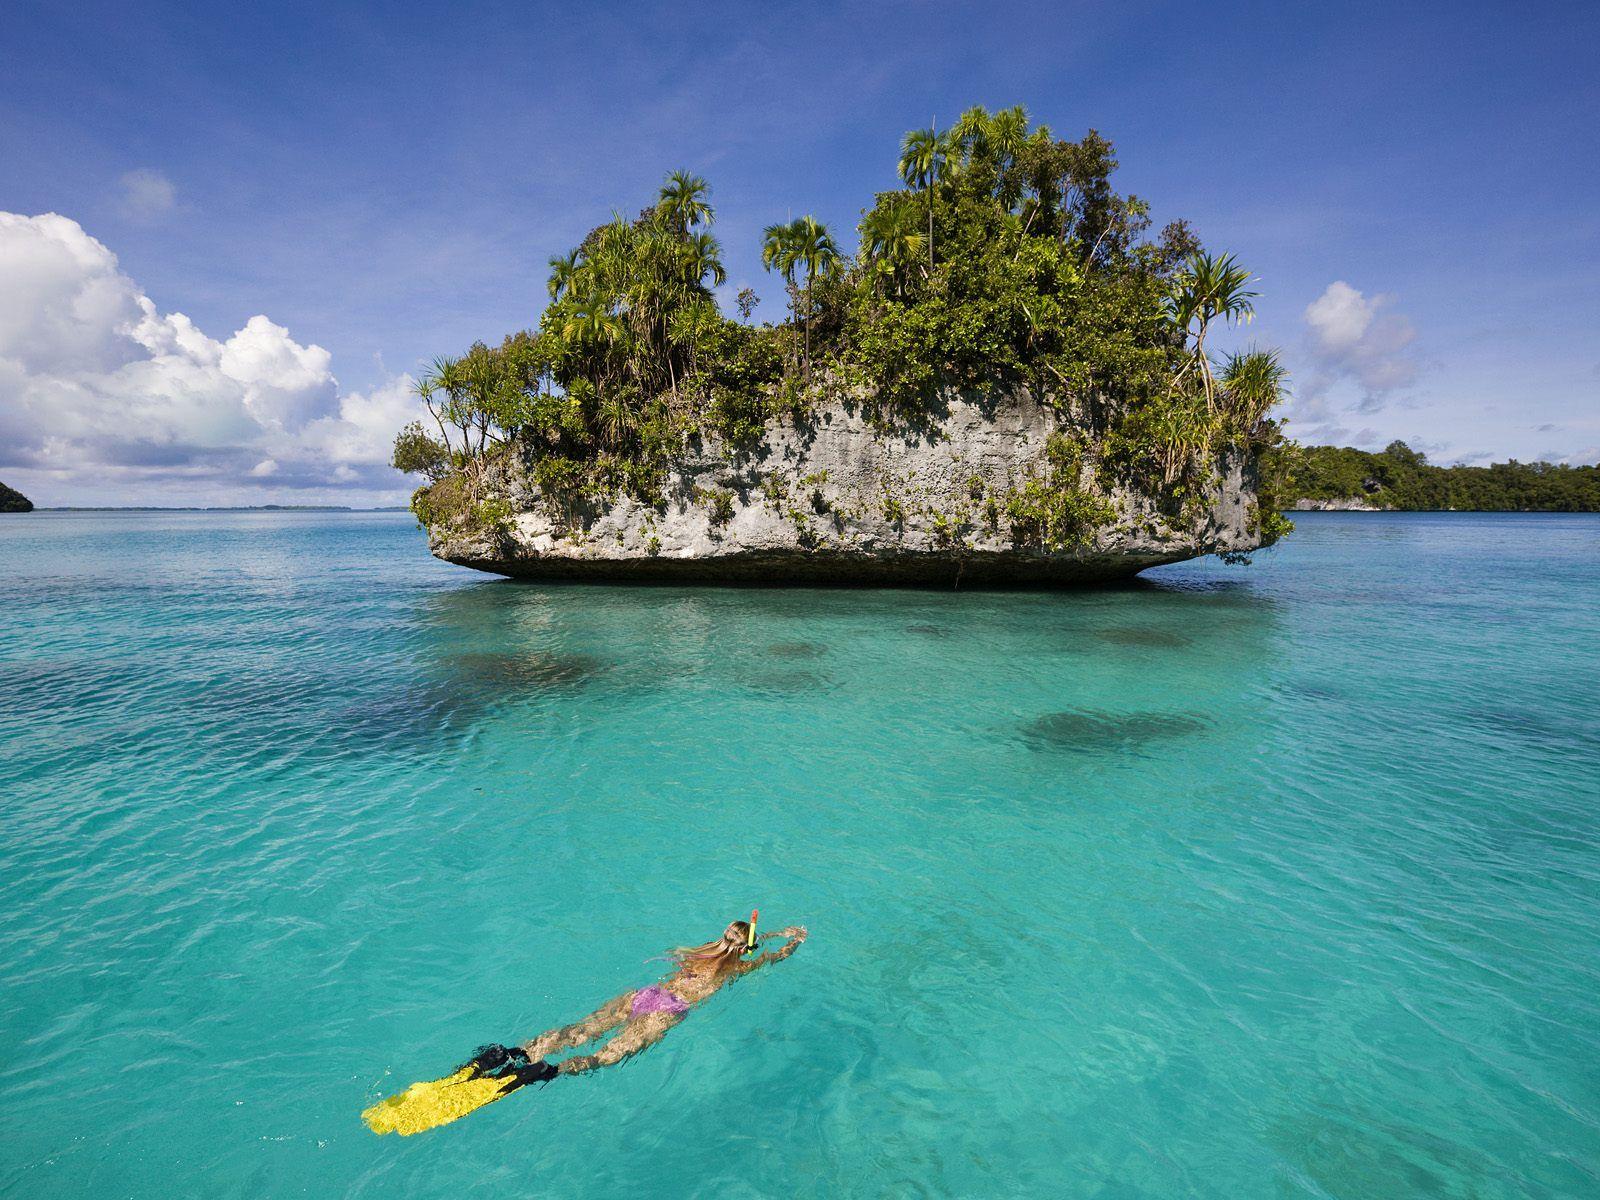 HD Tropical Beach Backgrounds